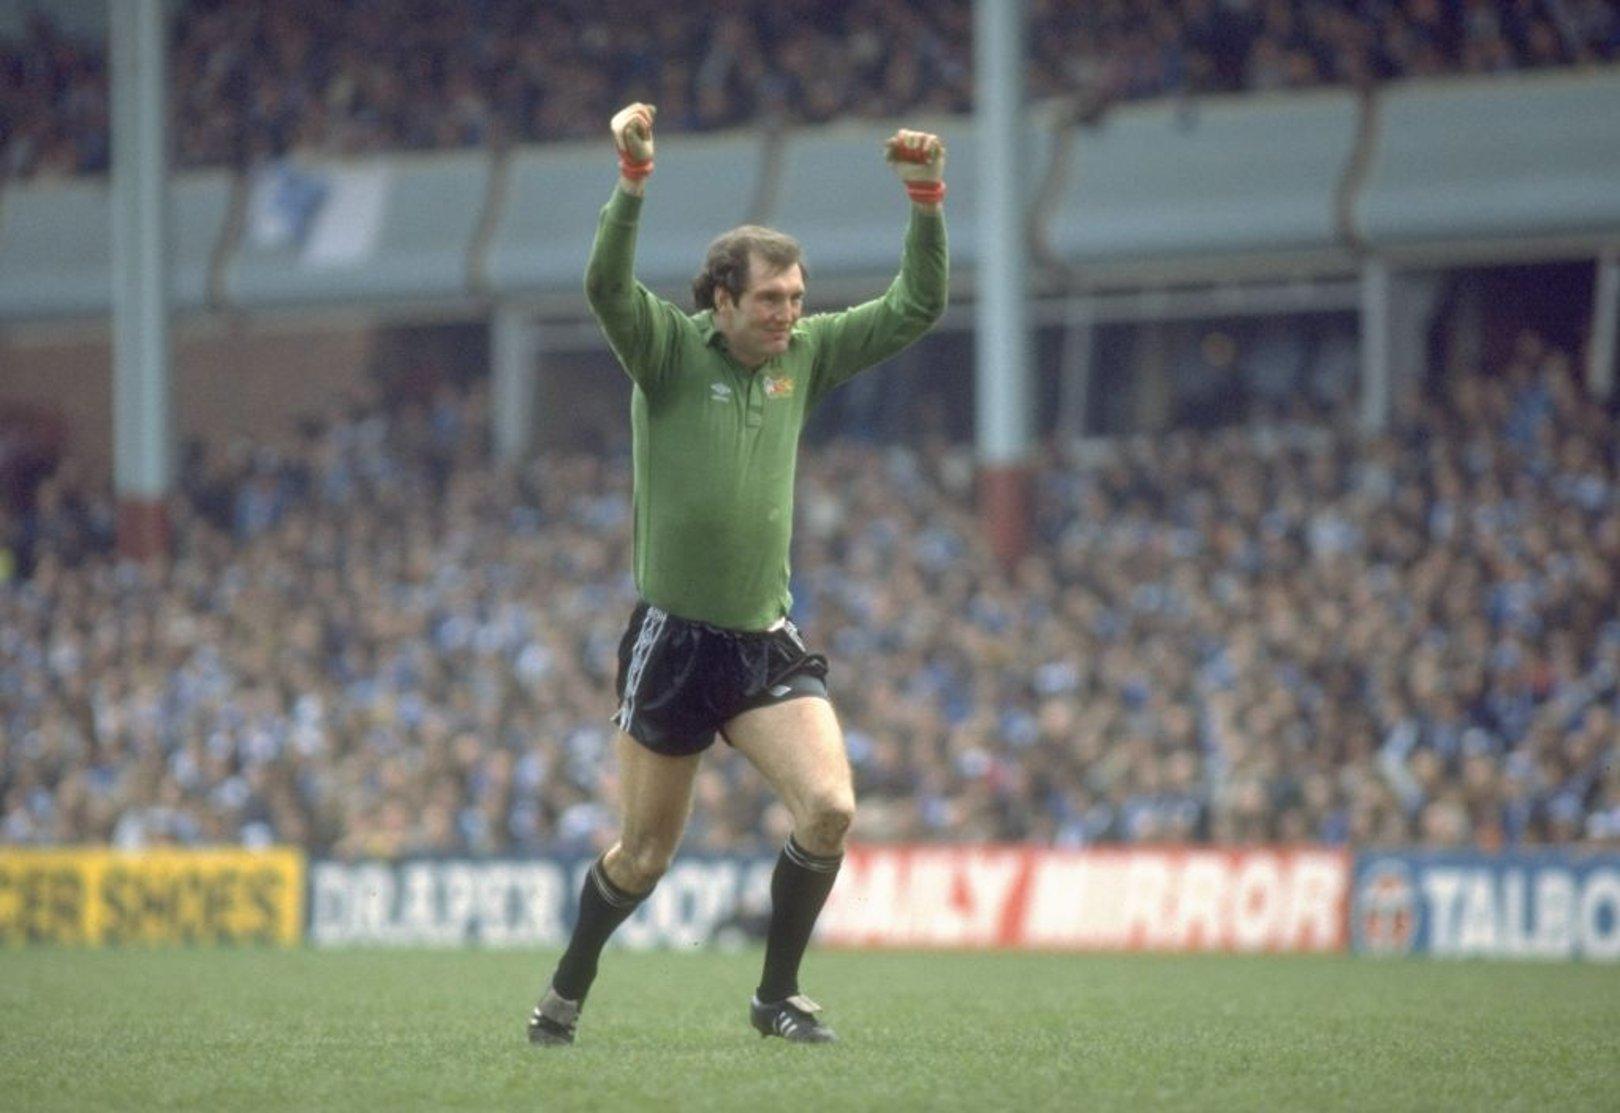 Joe Corrigan: The stuff of legend